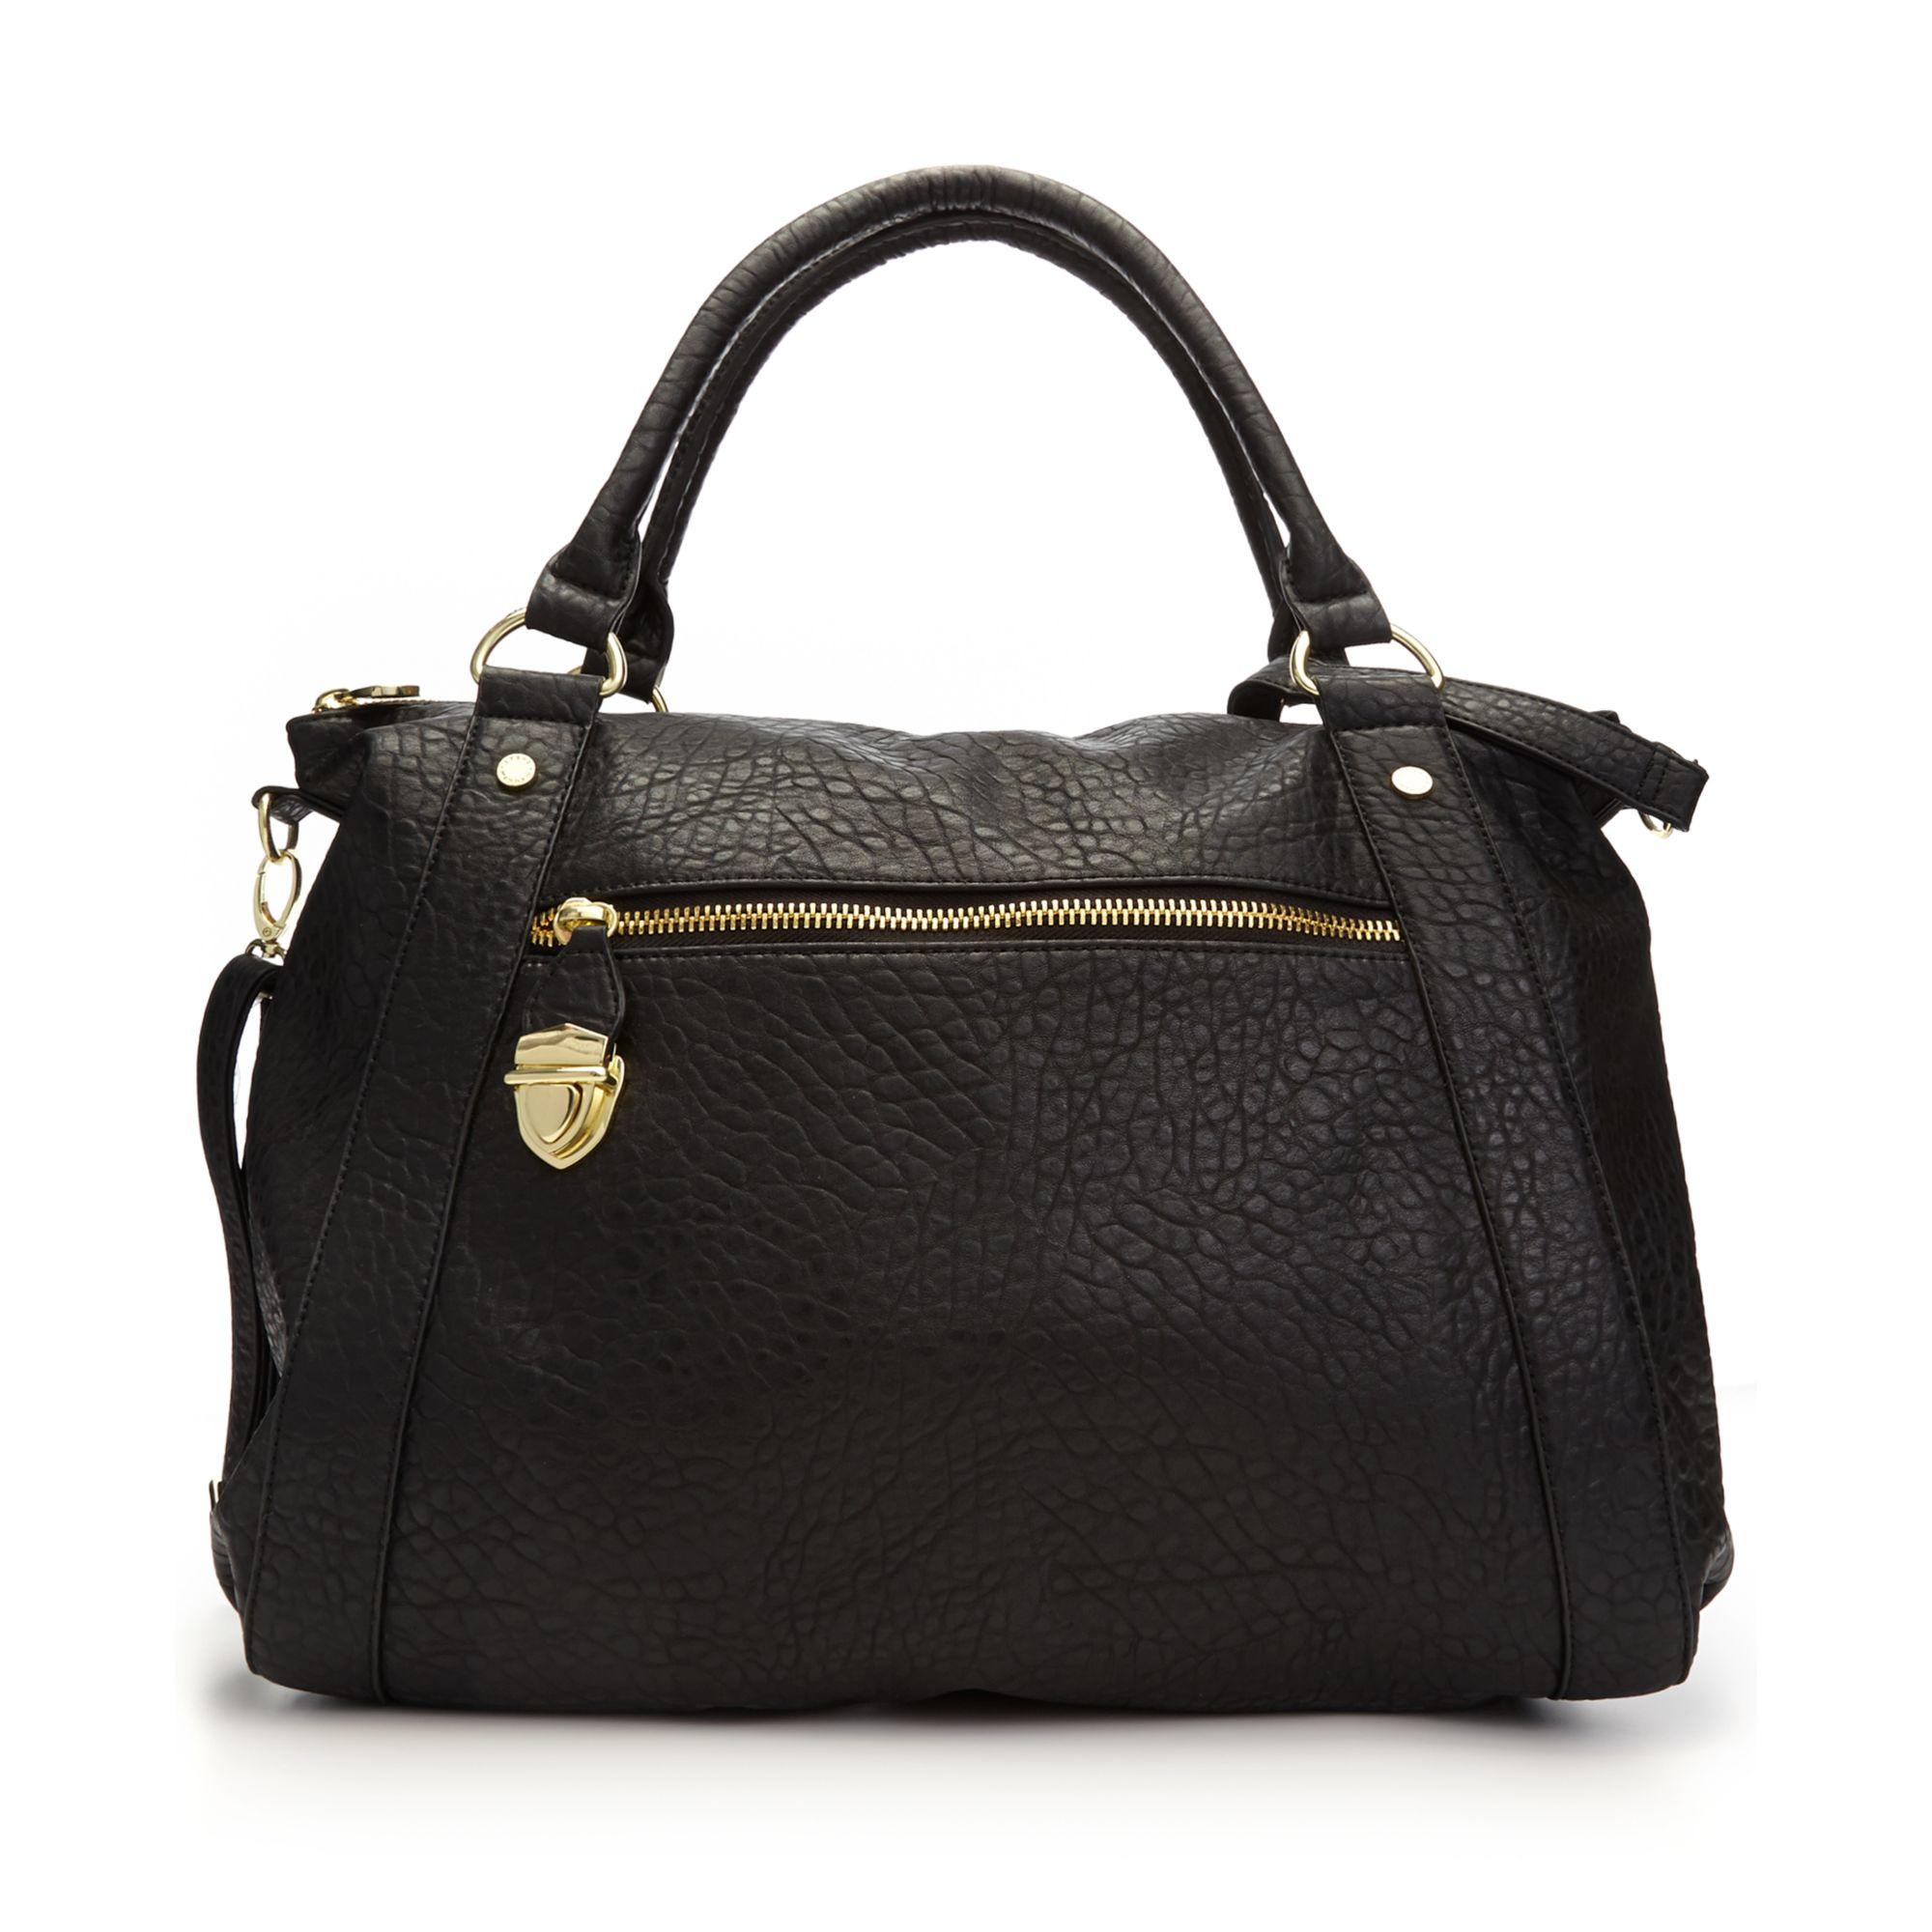 steve madden steve madden handbag bbarlow tote in black lyst